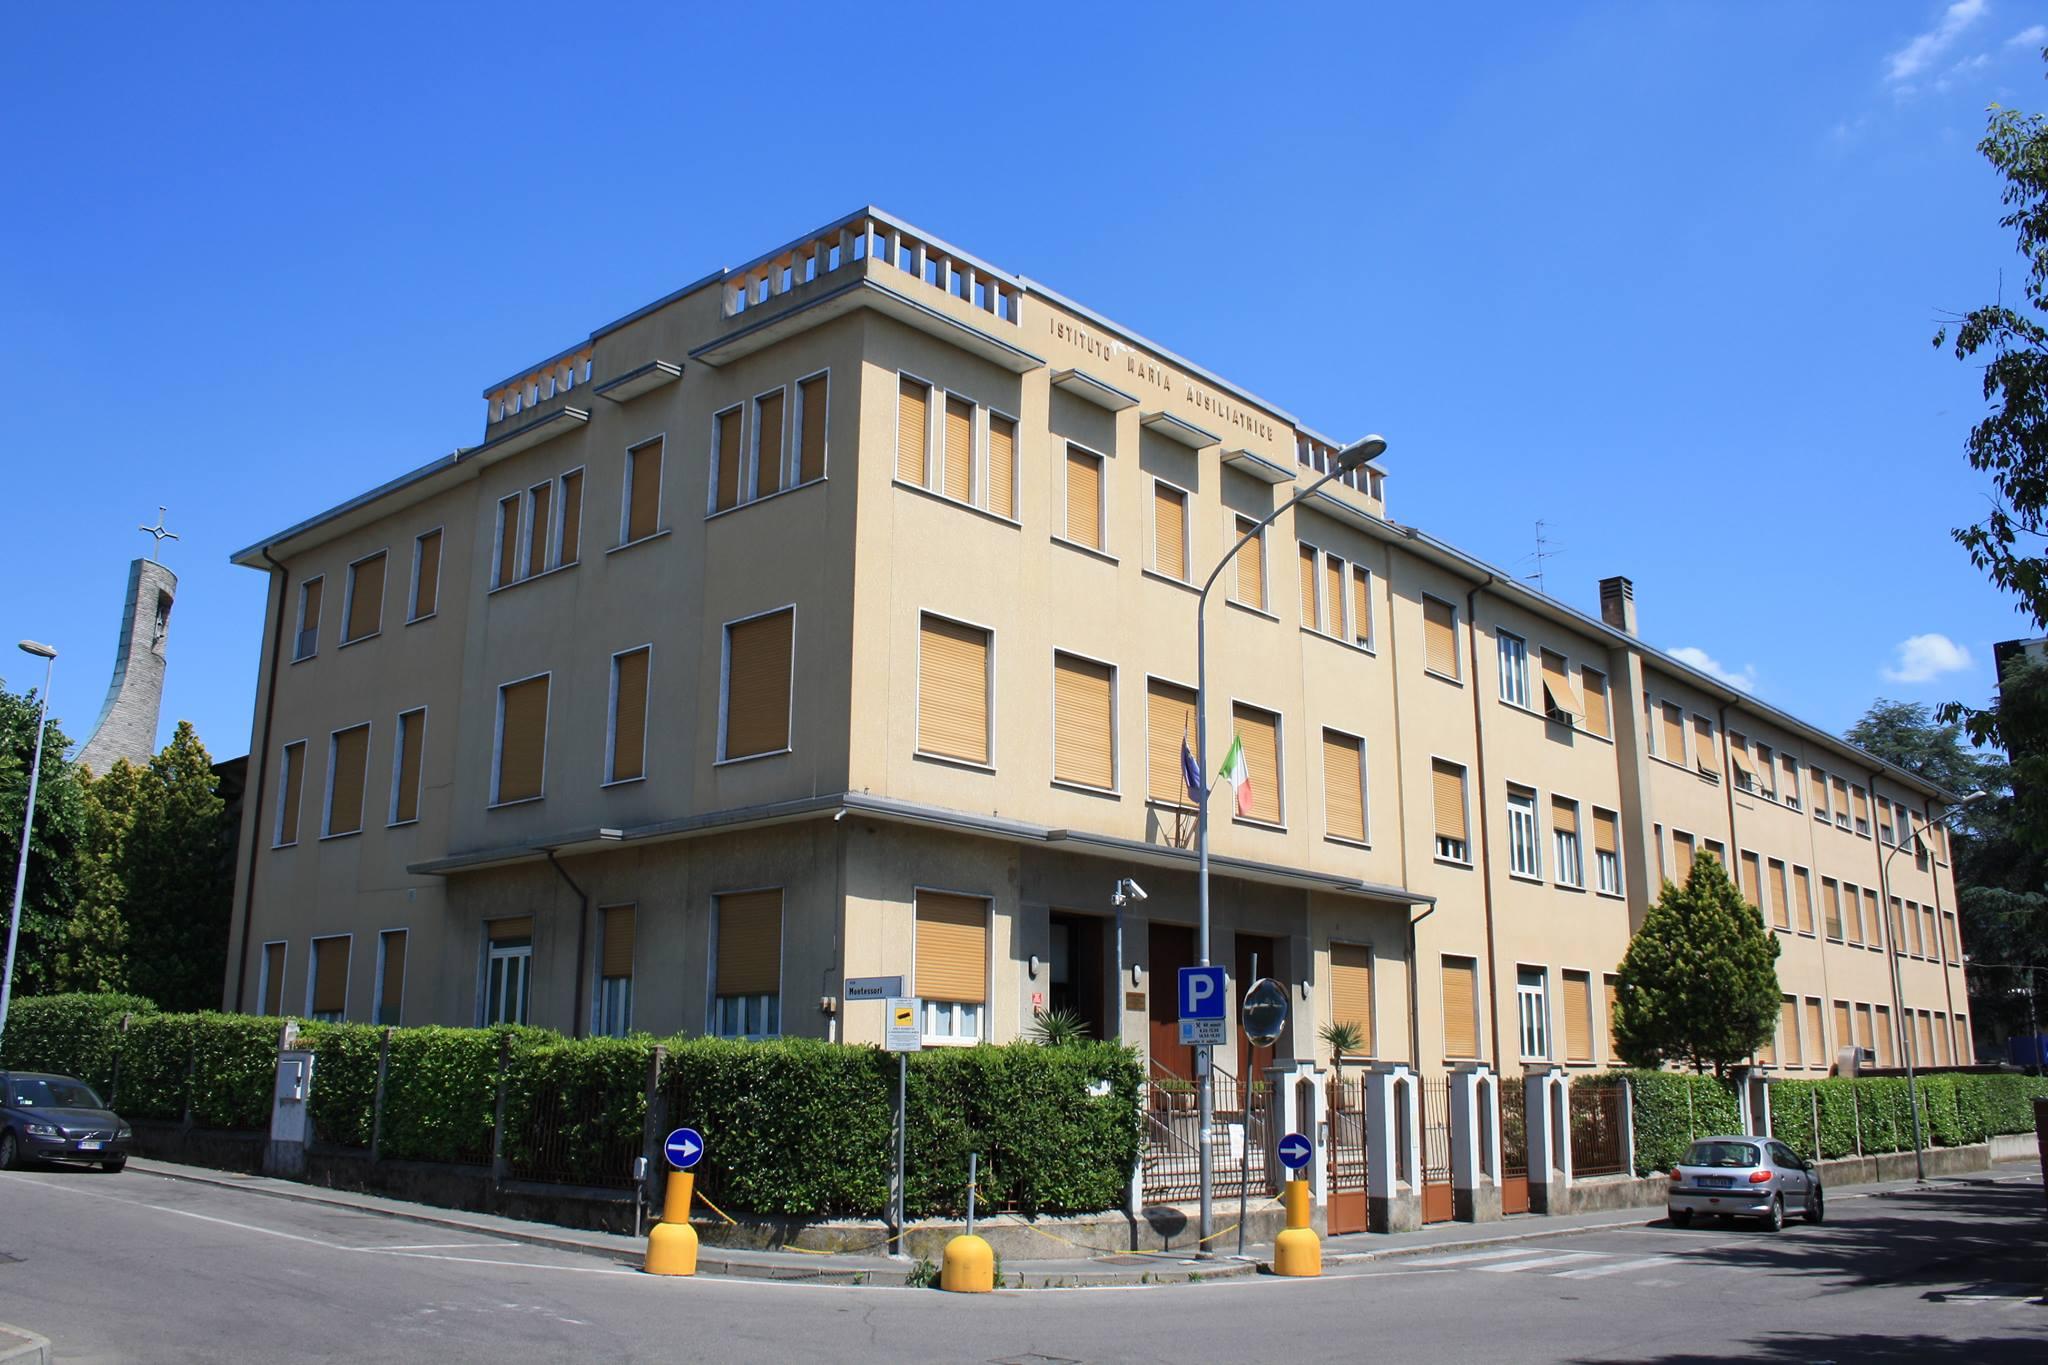 Istituto Maria Ausiliatrice Castellanza